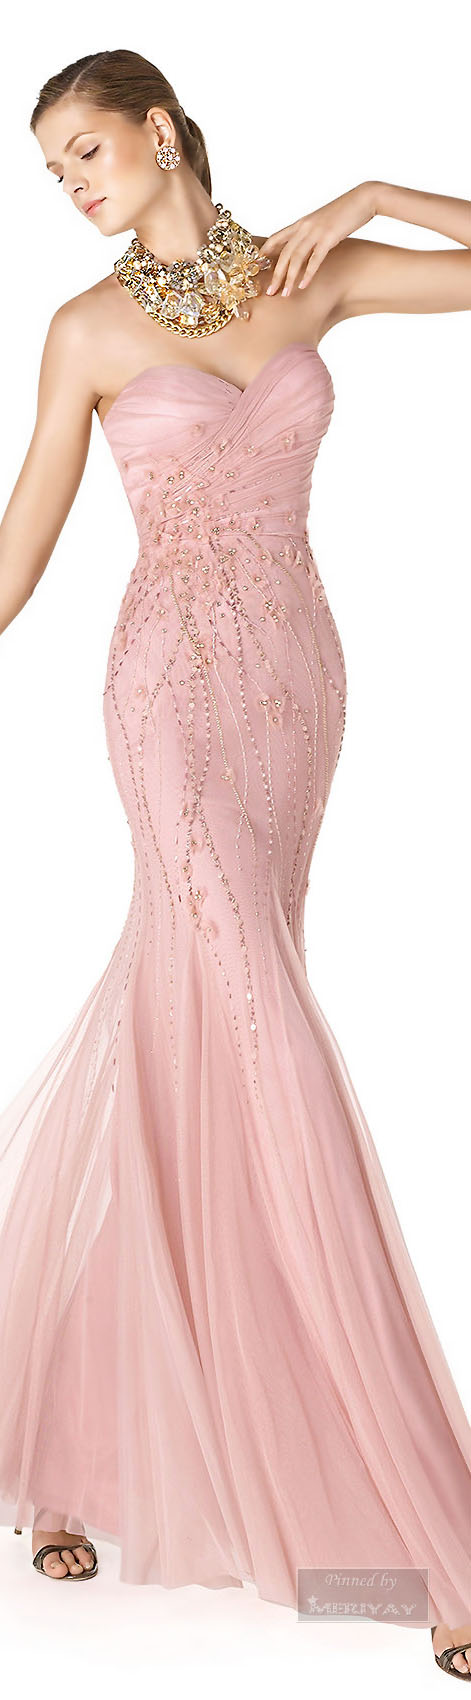 Vestido rosa claro | GALA DRESS☆ | Pinterest | Rosa clará, Couture ...